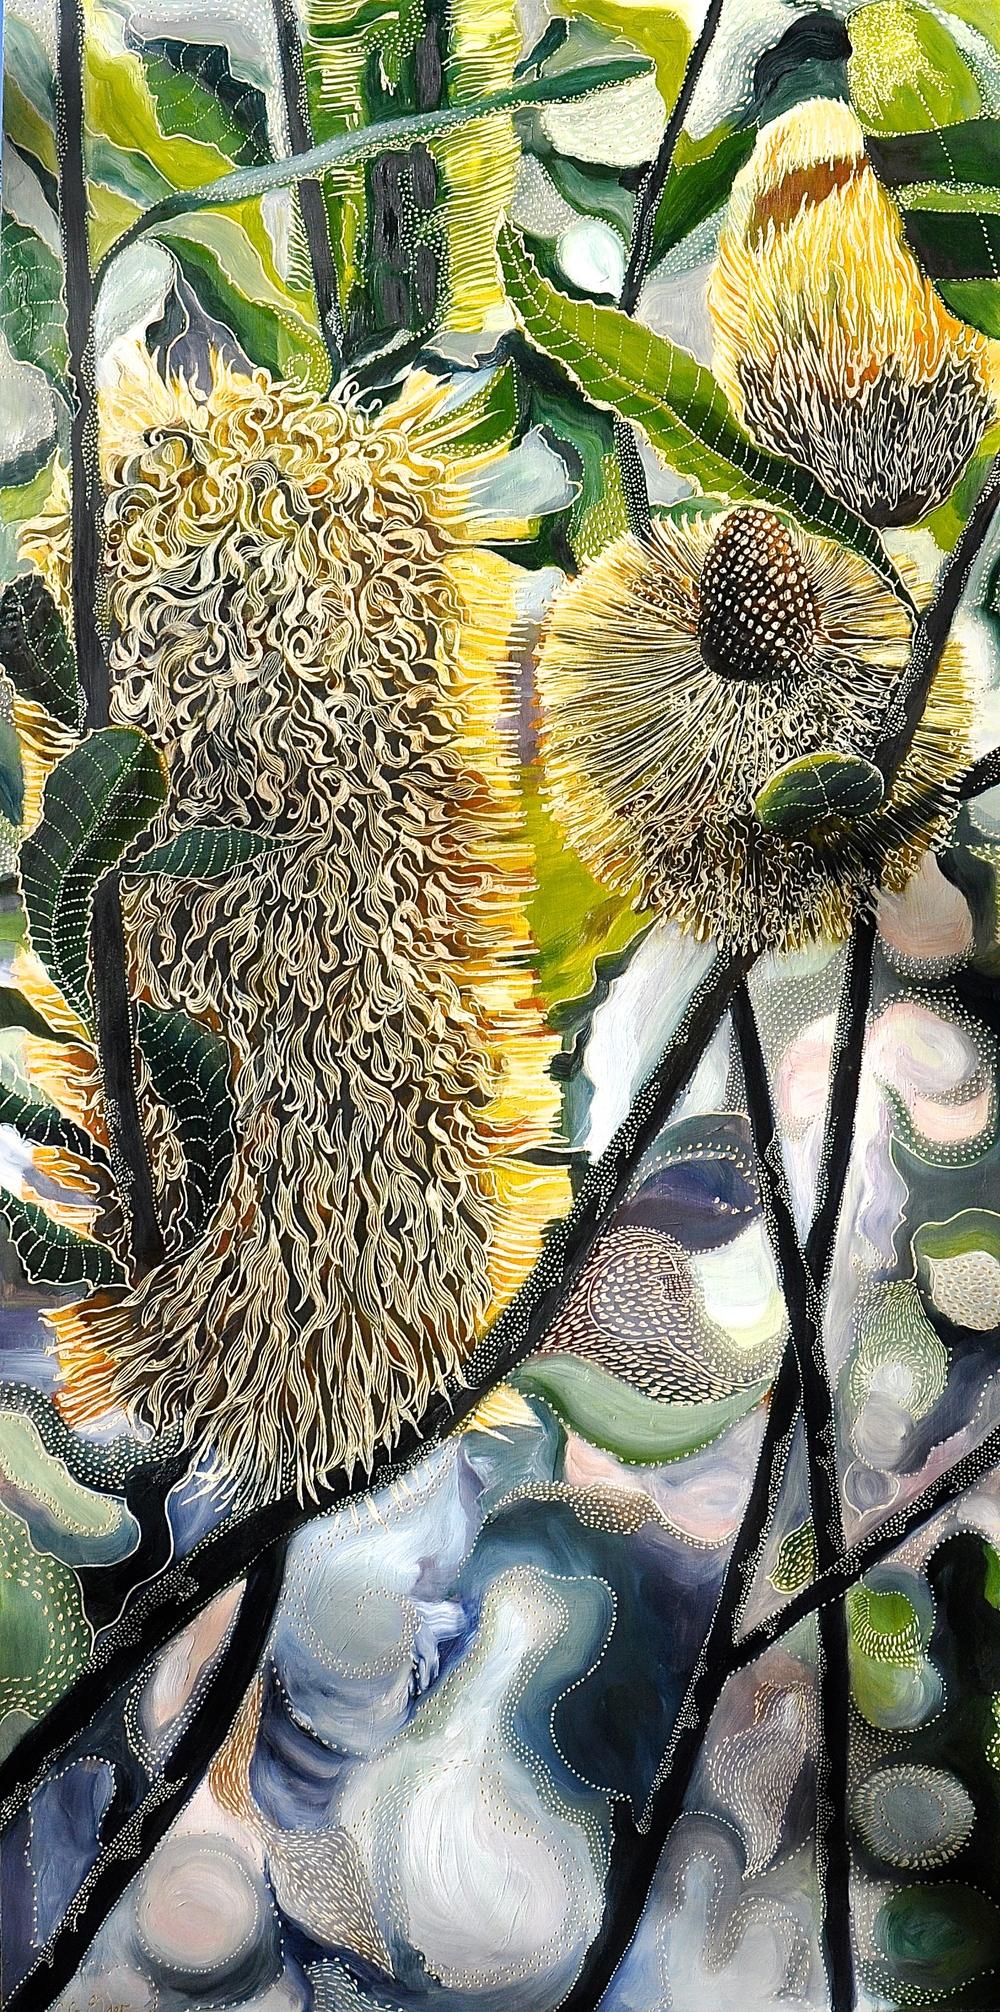 Homage to Swamp Banksias